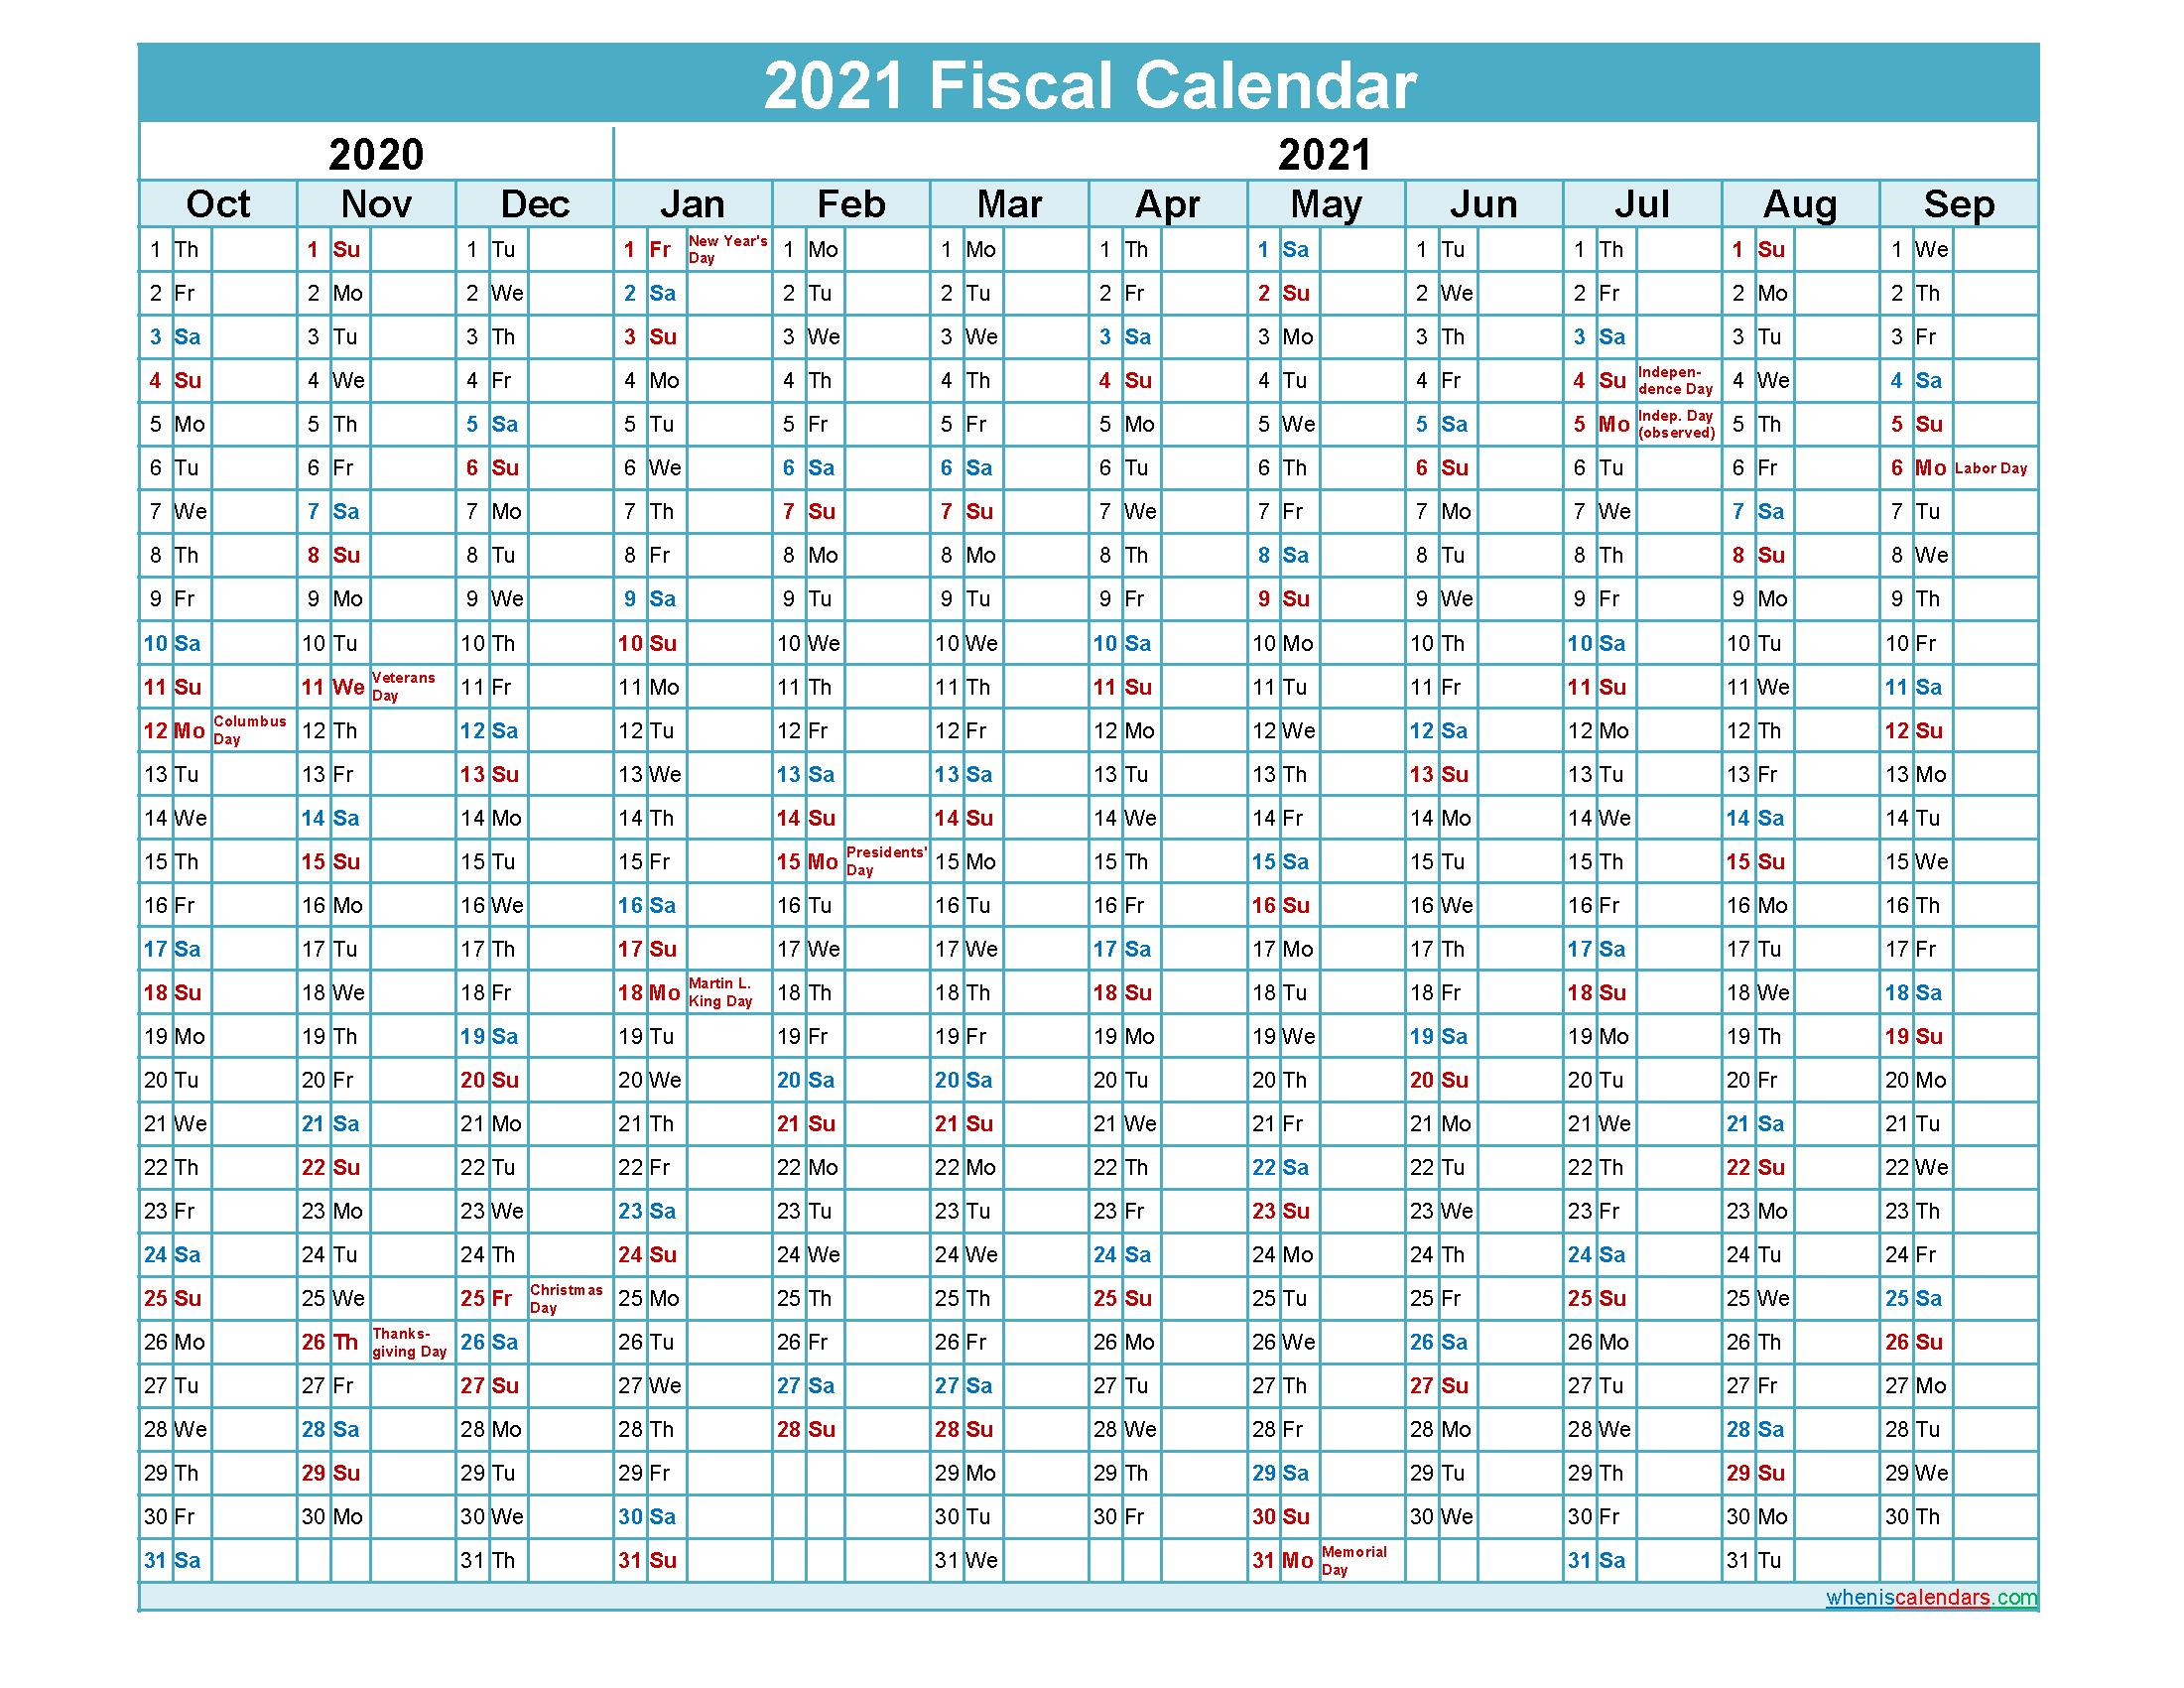 Fiscal Year Calendar 2021 Fiscal Calendar 2021 Federal Fiscal Year – Template No.fiscal21y43